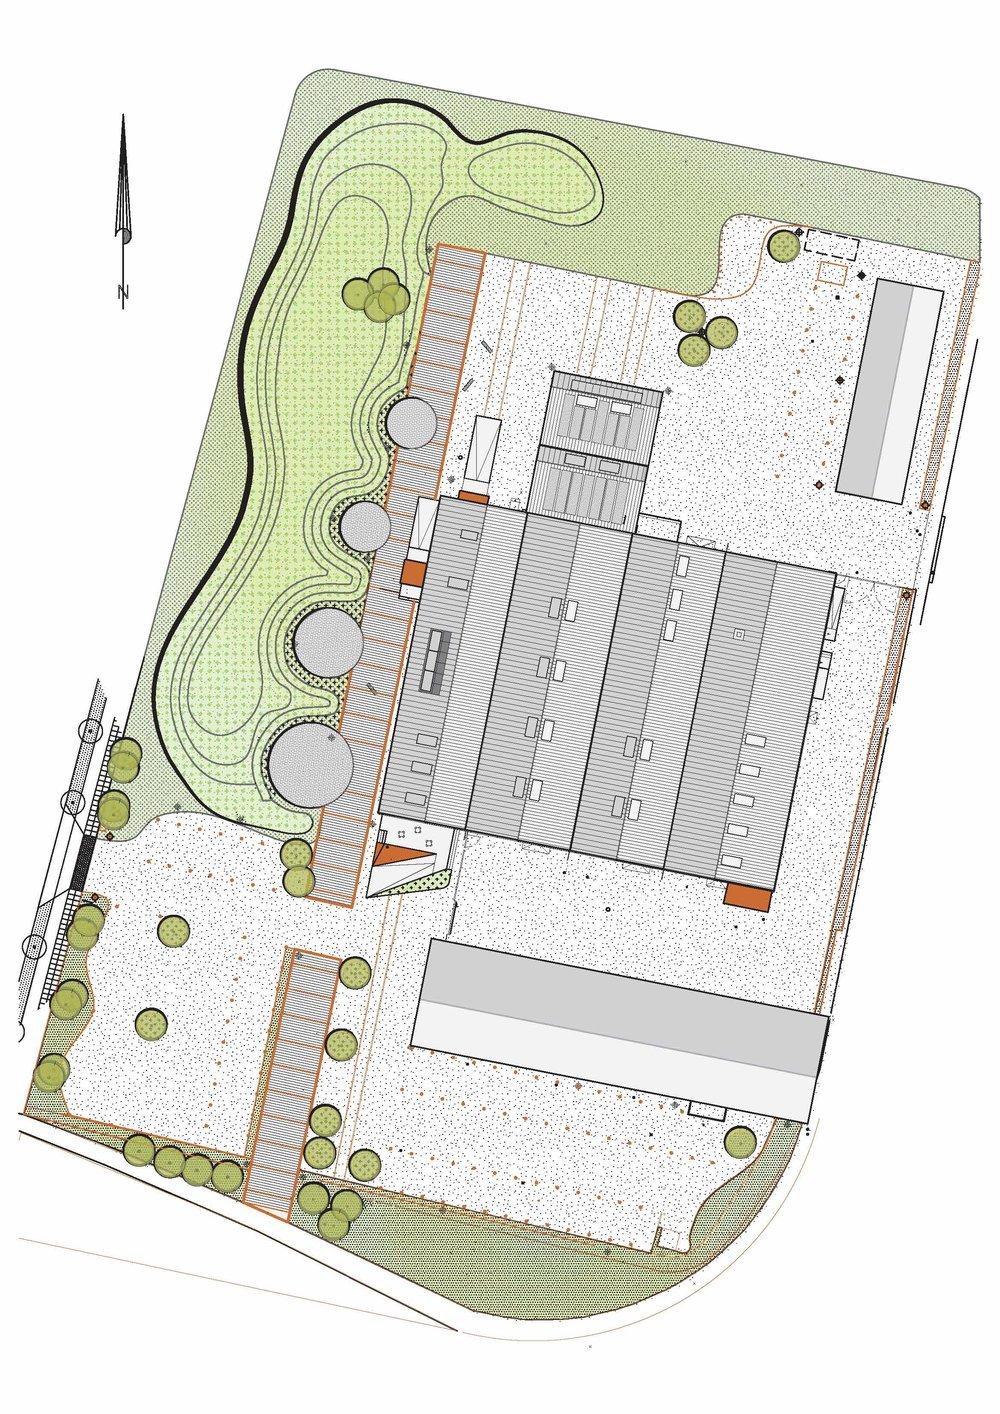 Nyborg landskab color 02.jpg